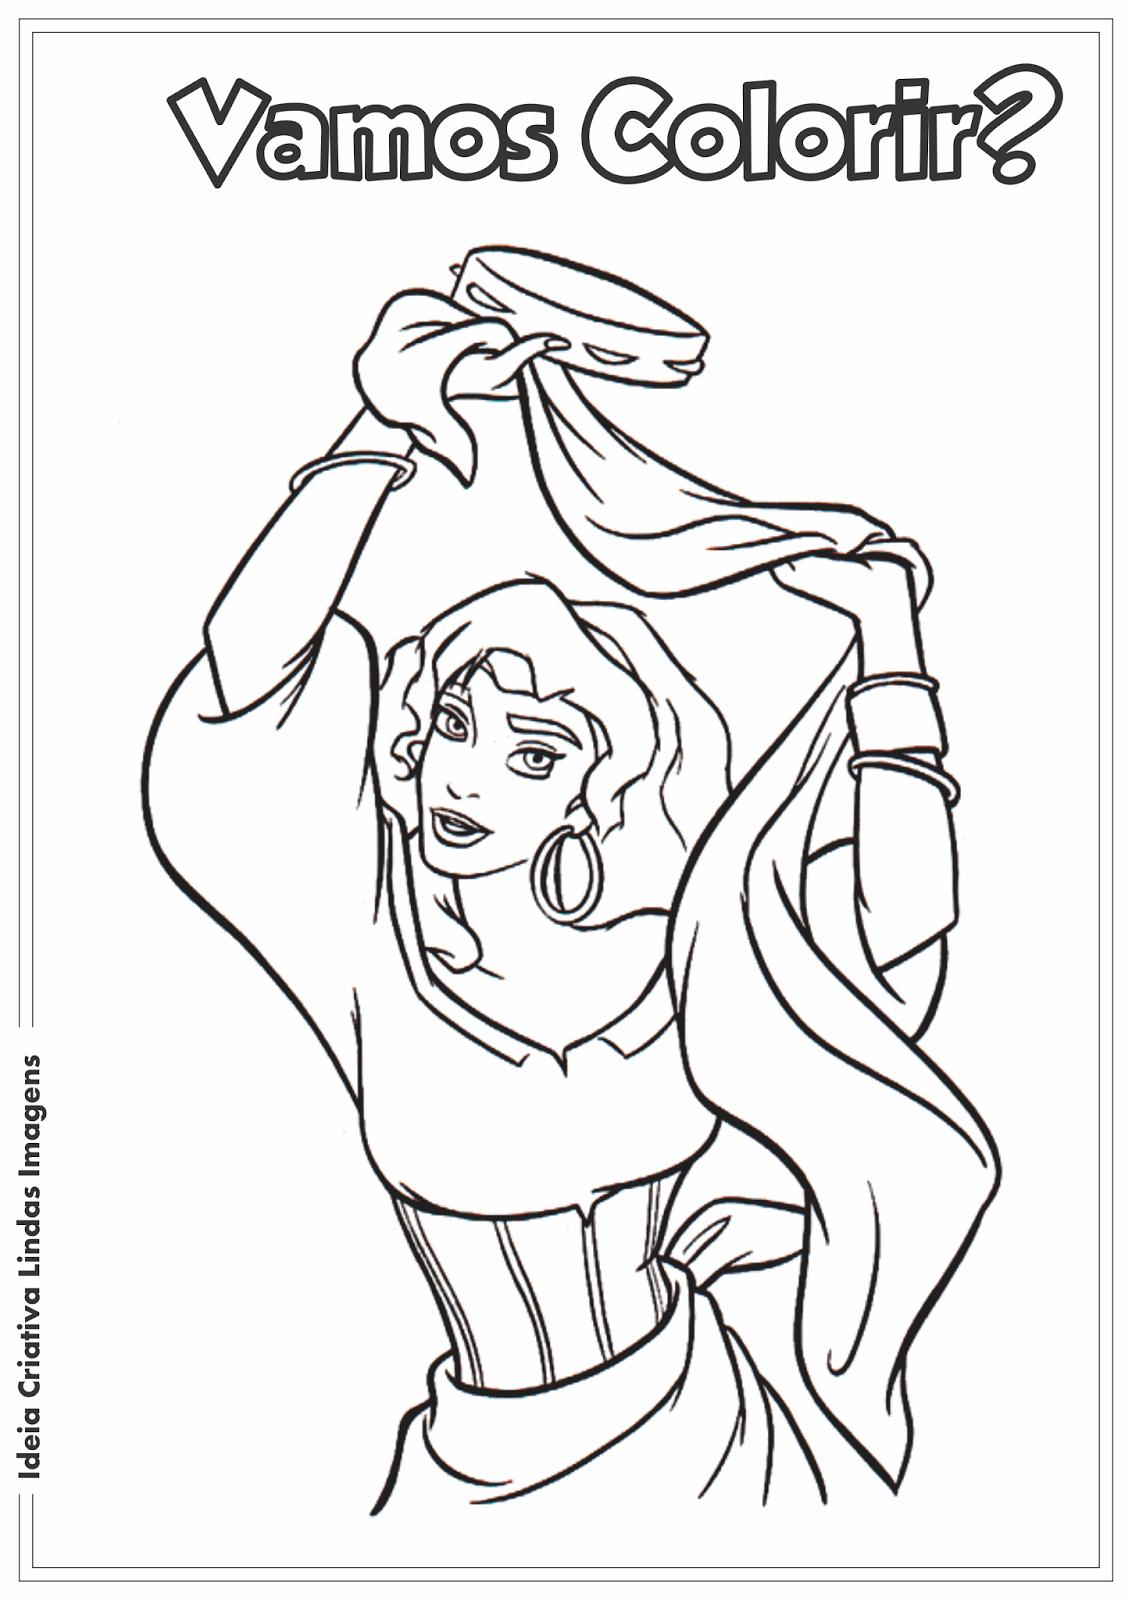 O Corcunda de Notre Dame - Esmeralda desenho pra colorir